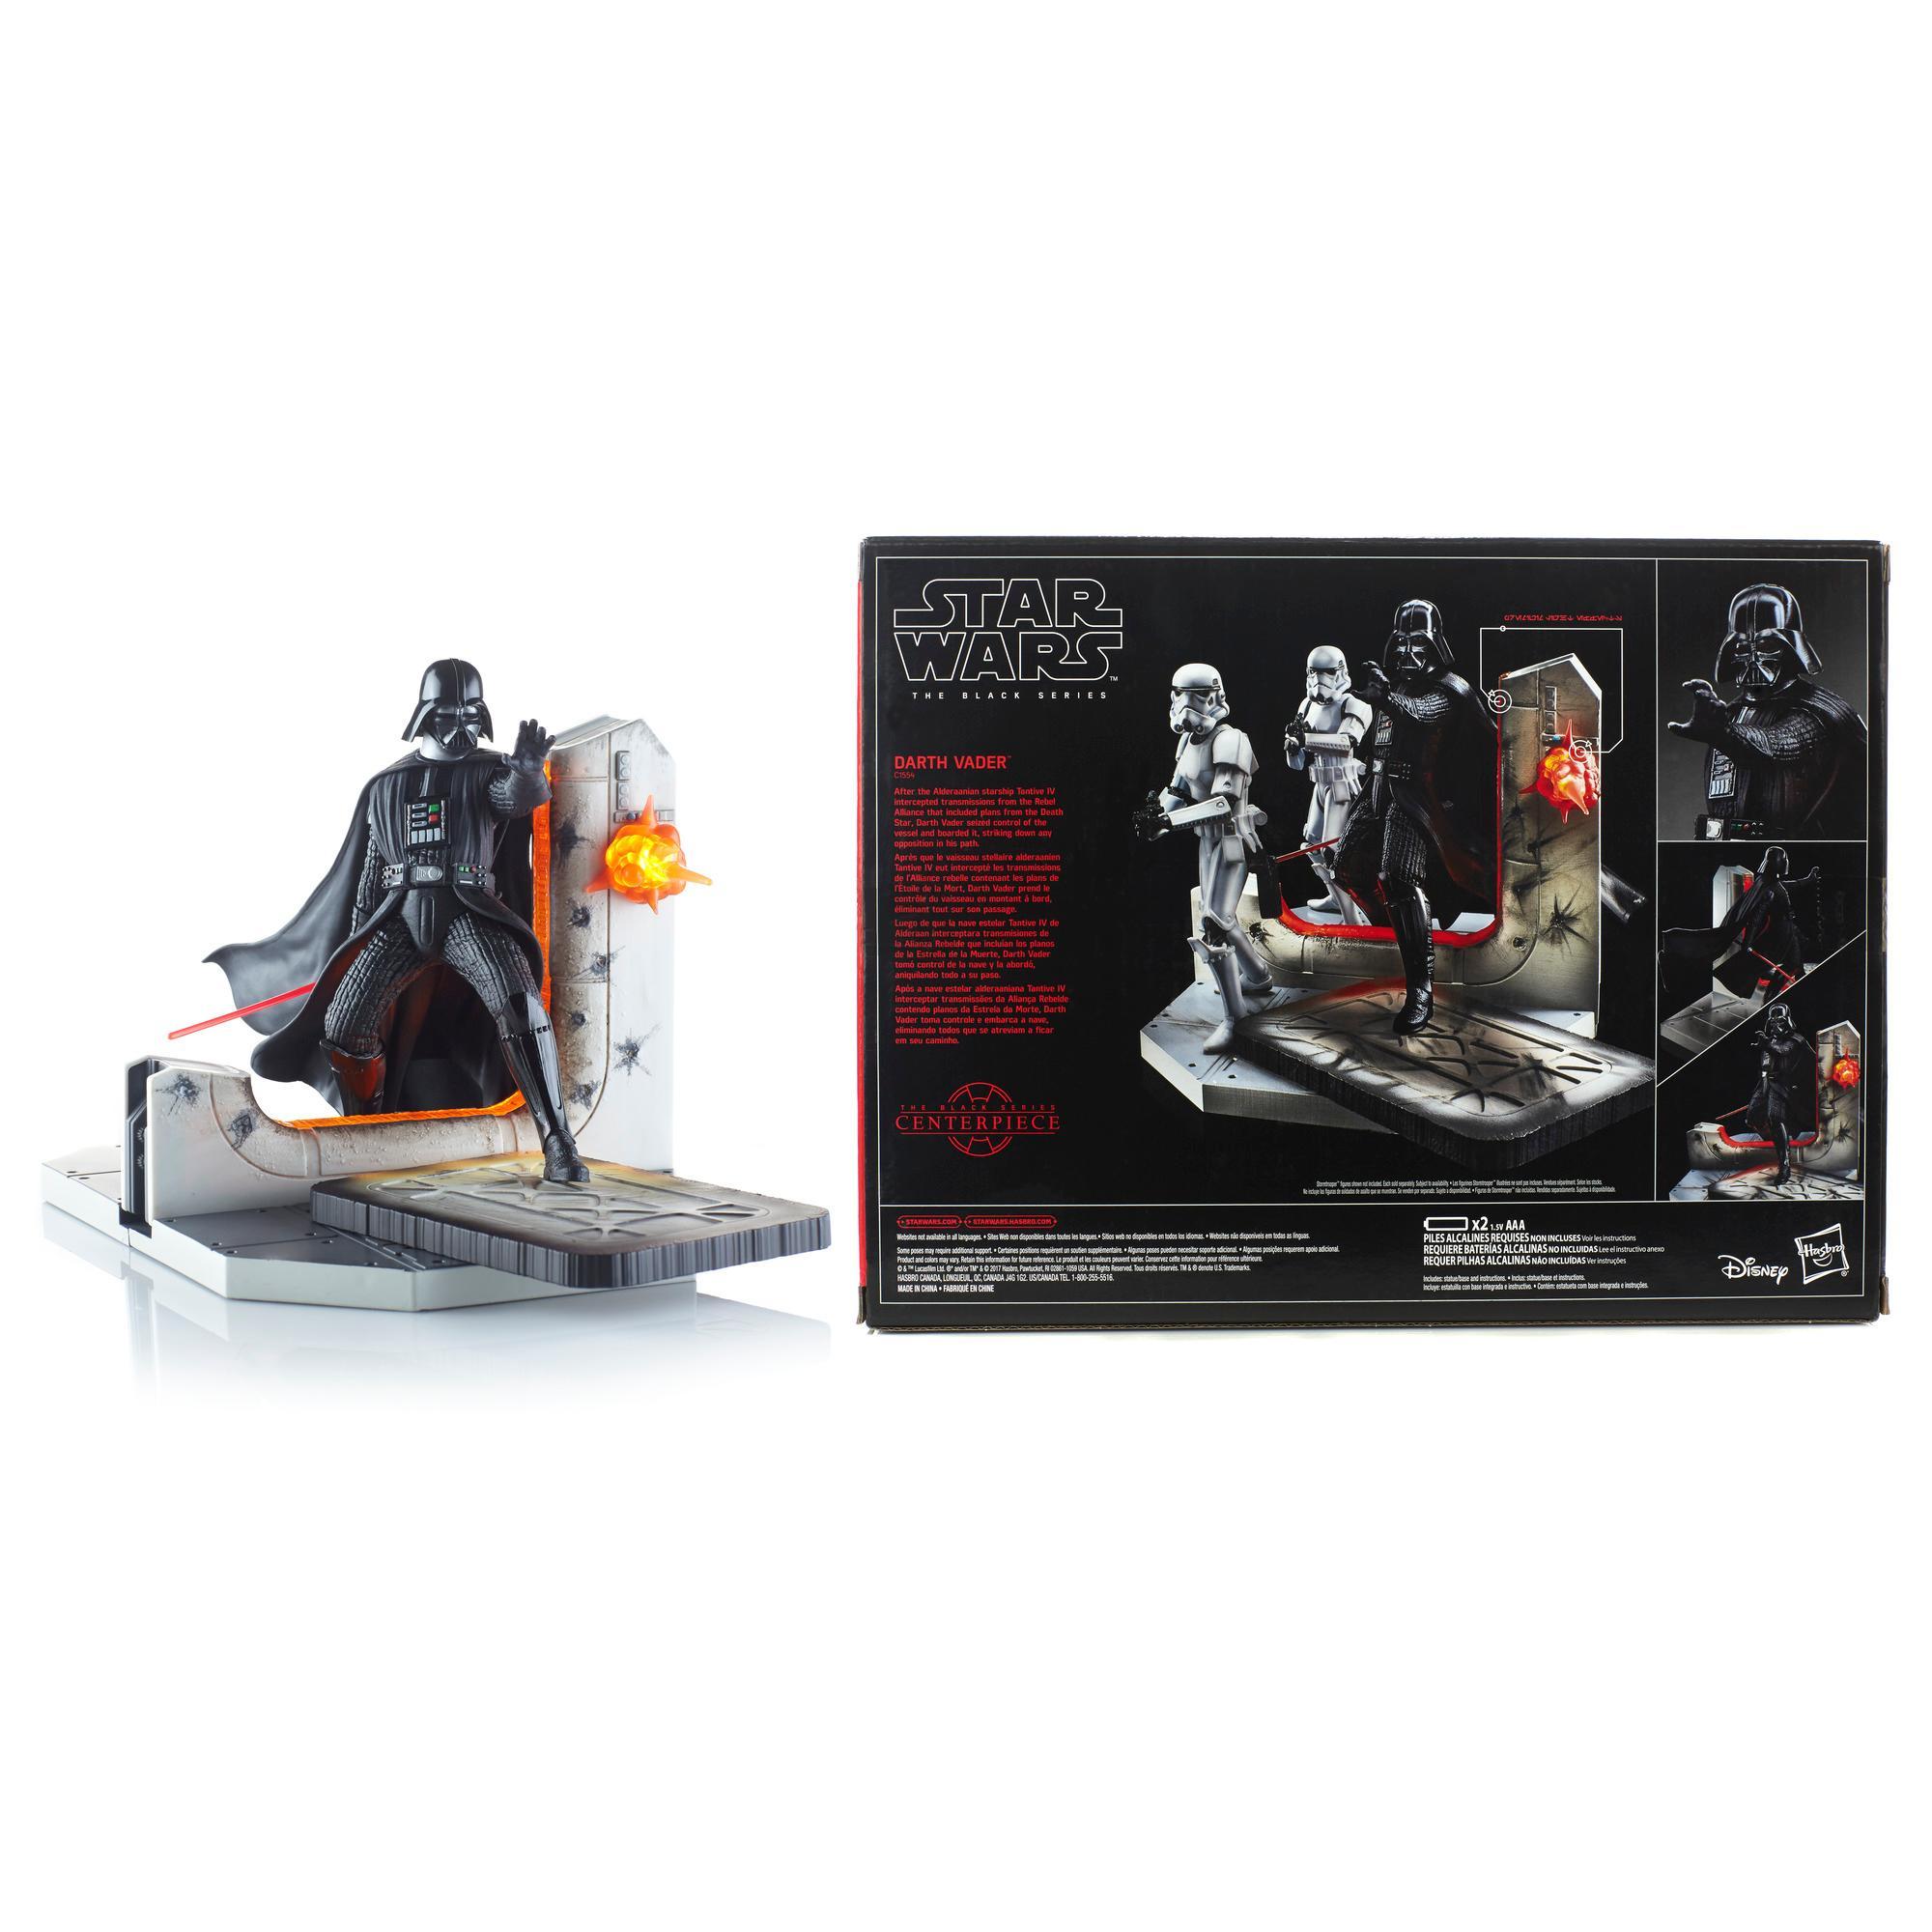 Star Wars The Black Series - Estatueta Darth Vader